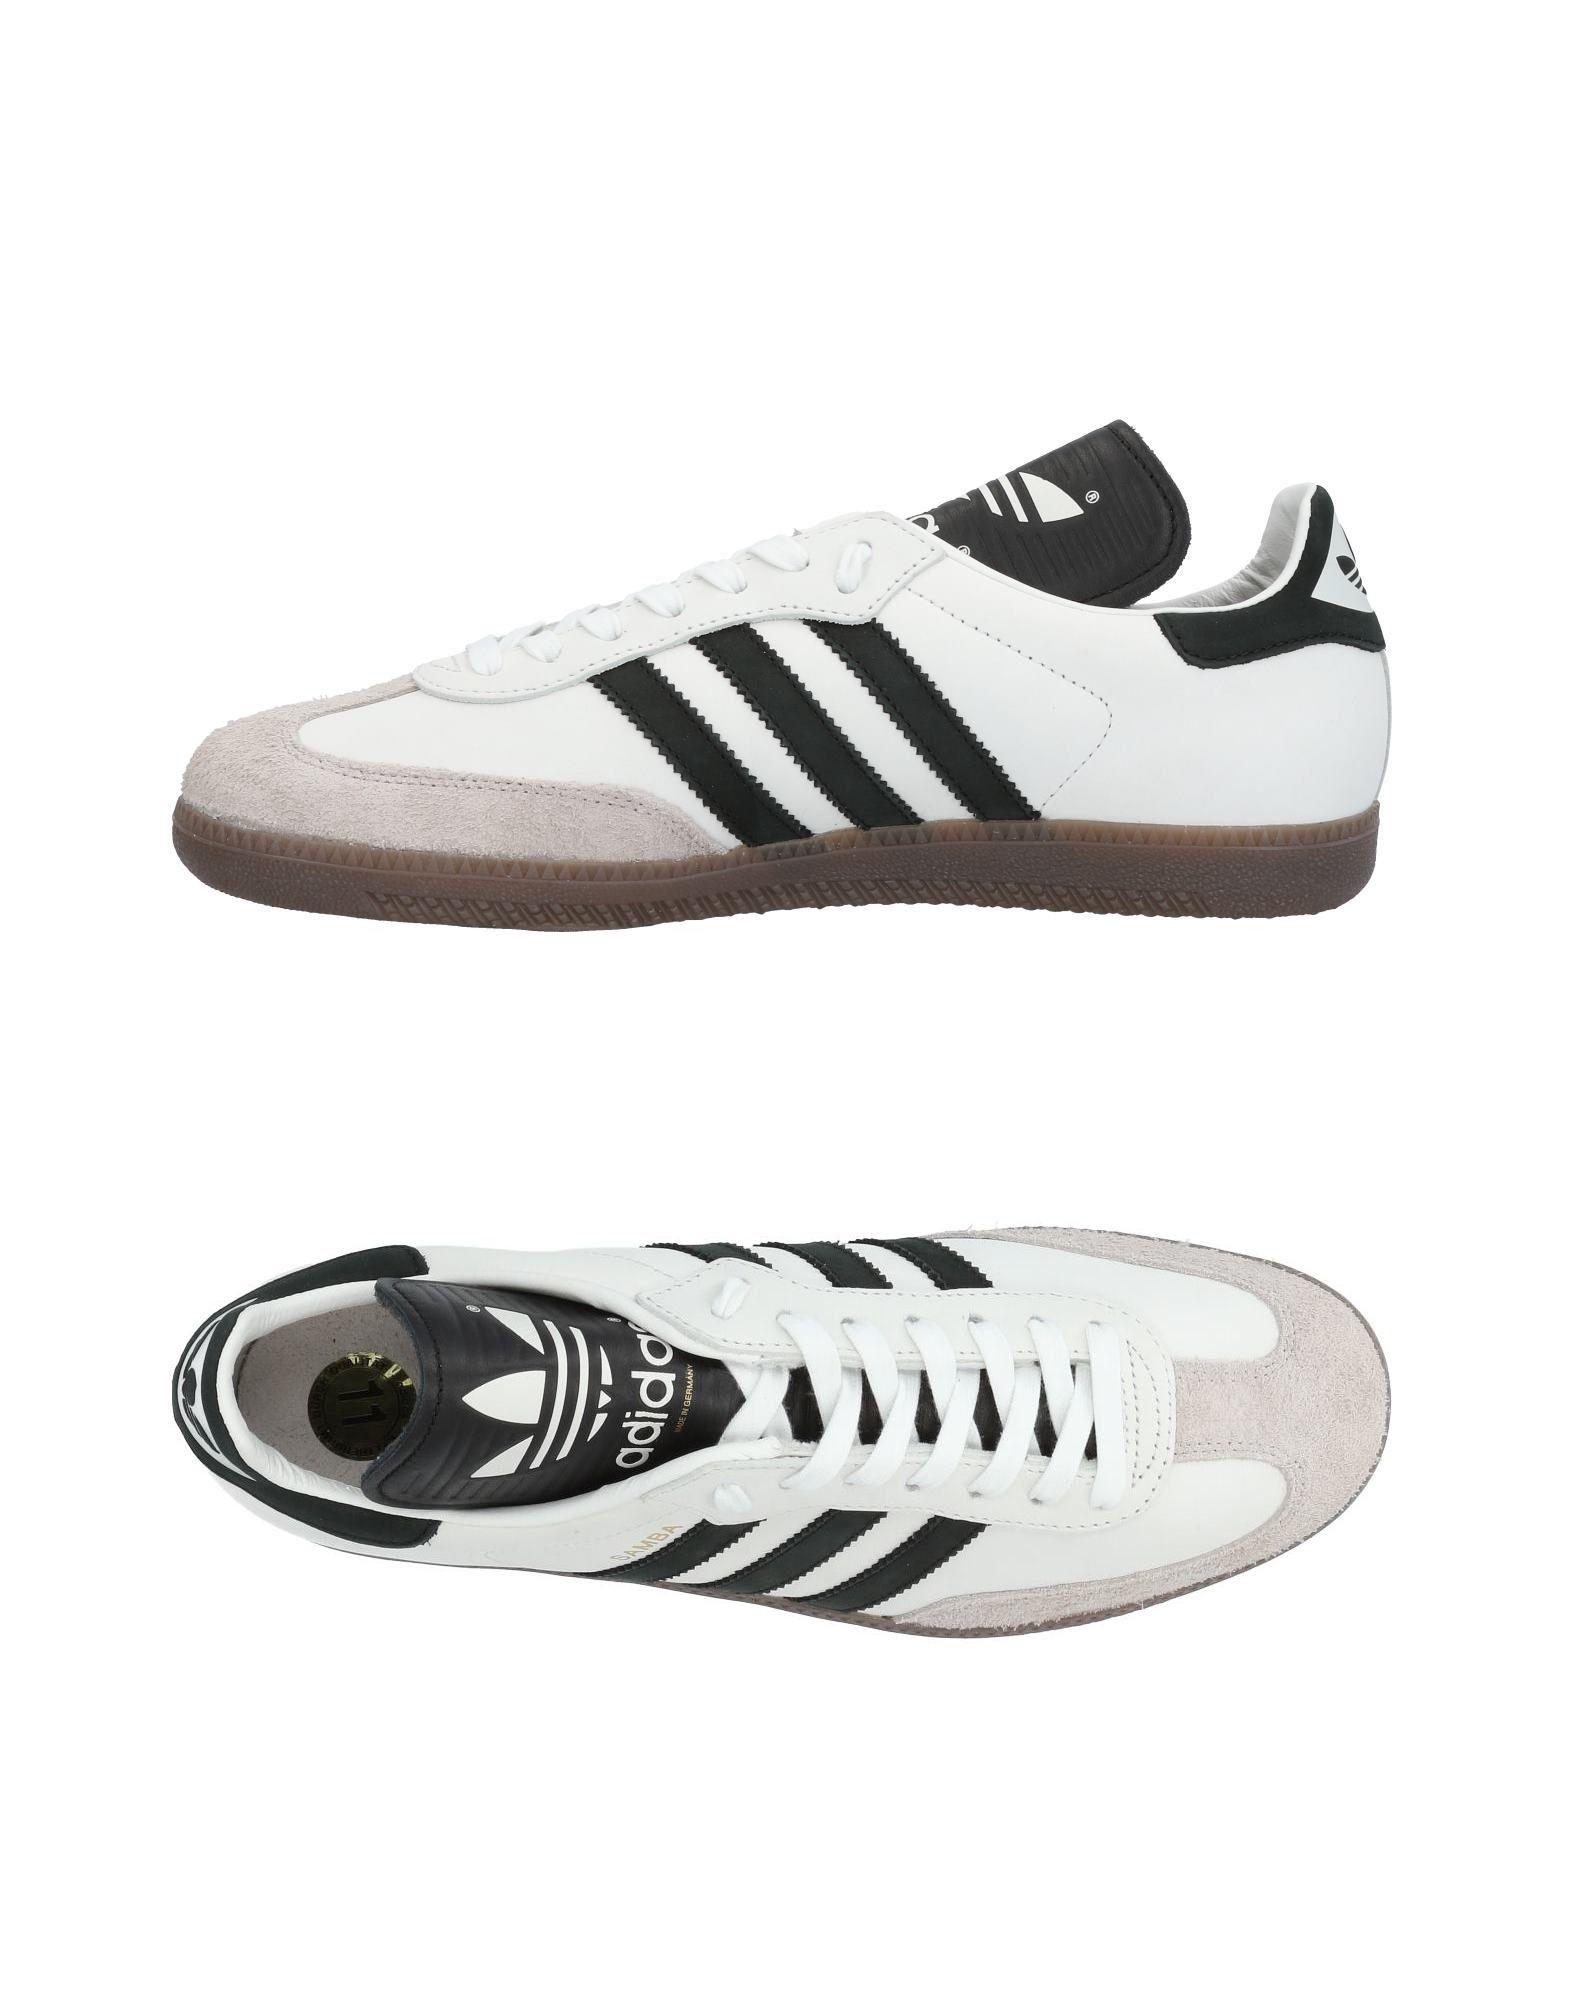 Baskets Adidas Originals Homme - Baskets Adidas Originals  Blanc Confortable et belle